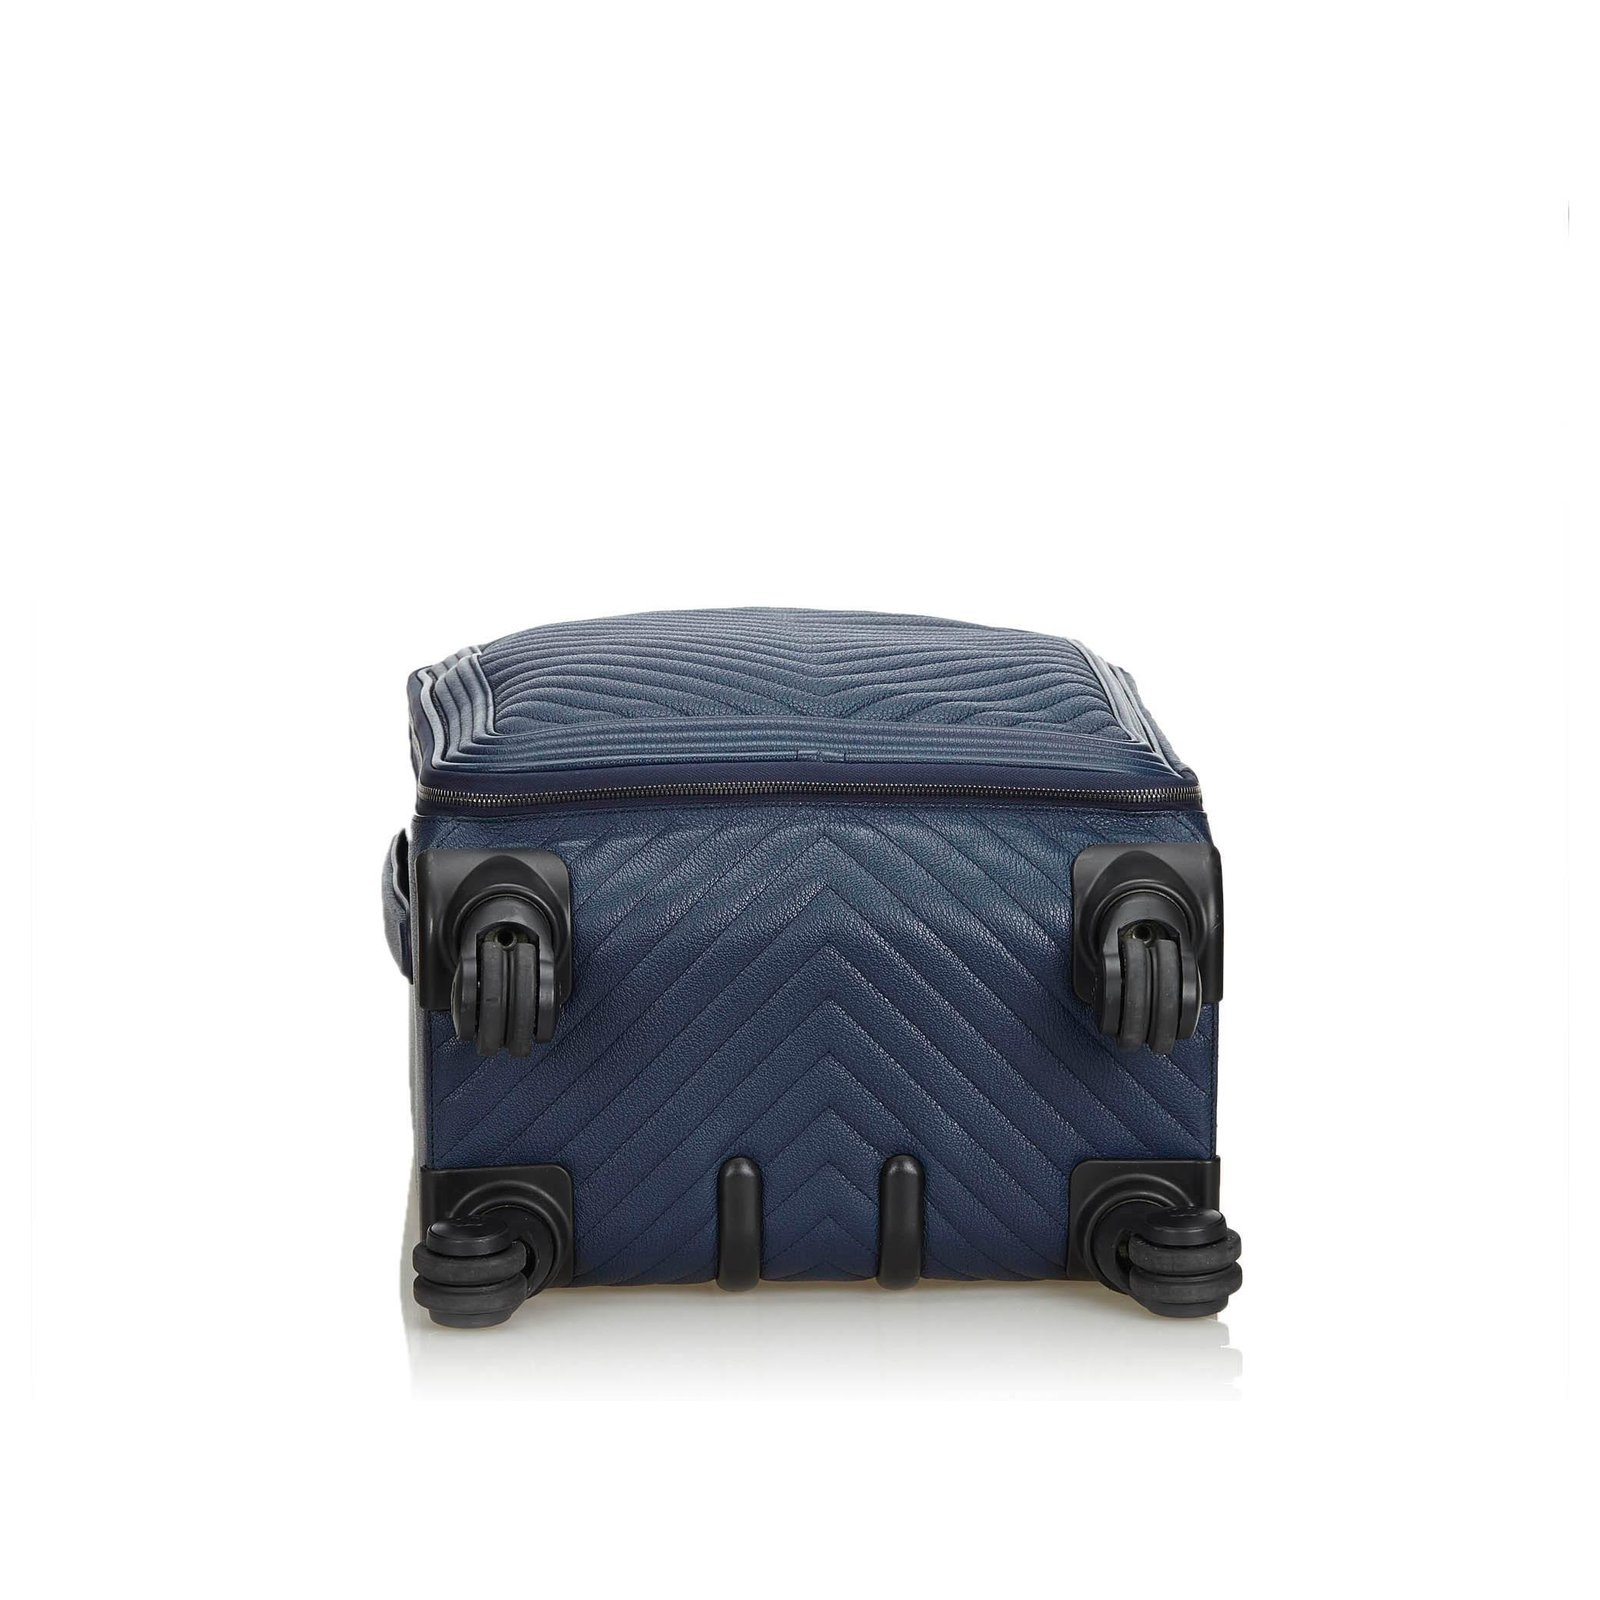 5dfe9629e2ff2d Chanel Chanel Blue Caviar Coco Case Trolley Travel bag Leather Blue  ref.126336 - Joli Closet